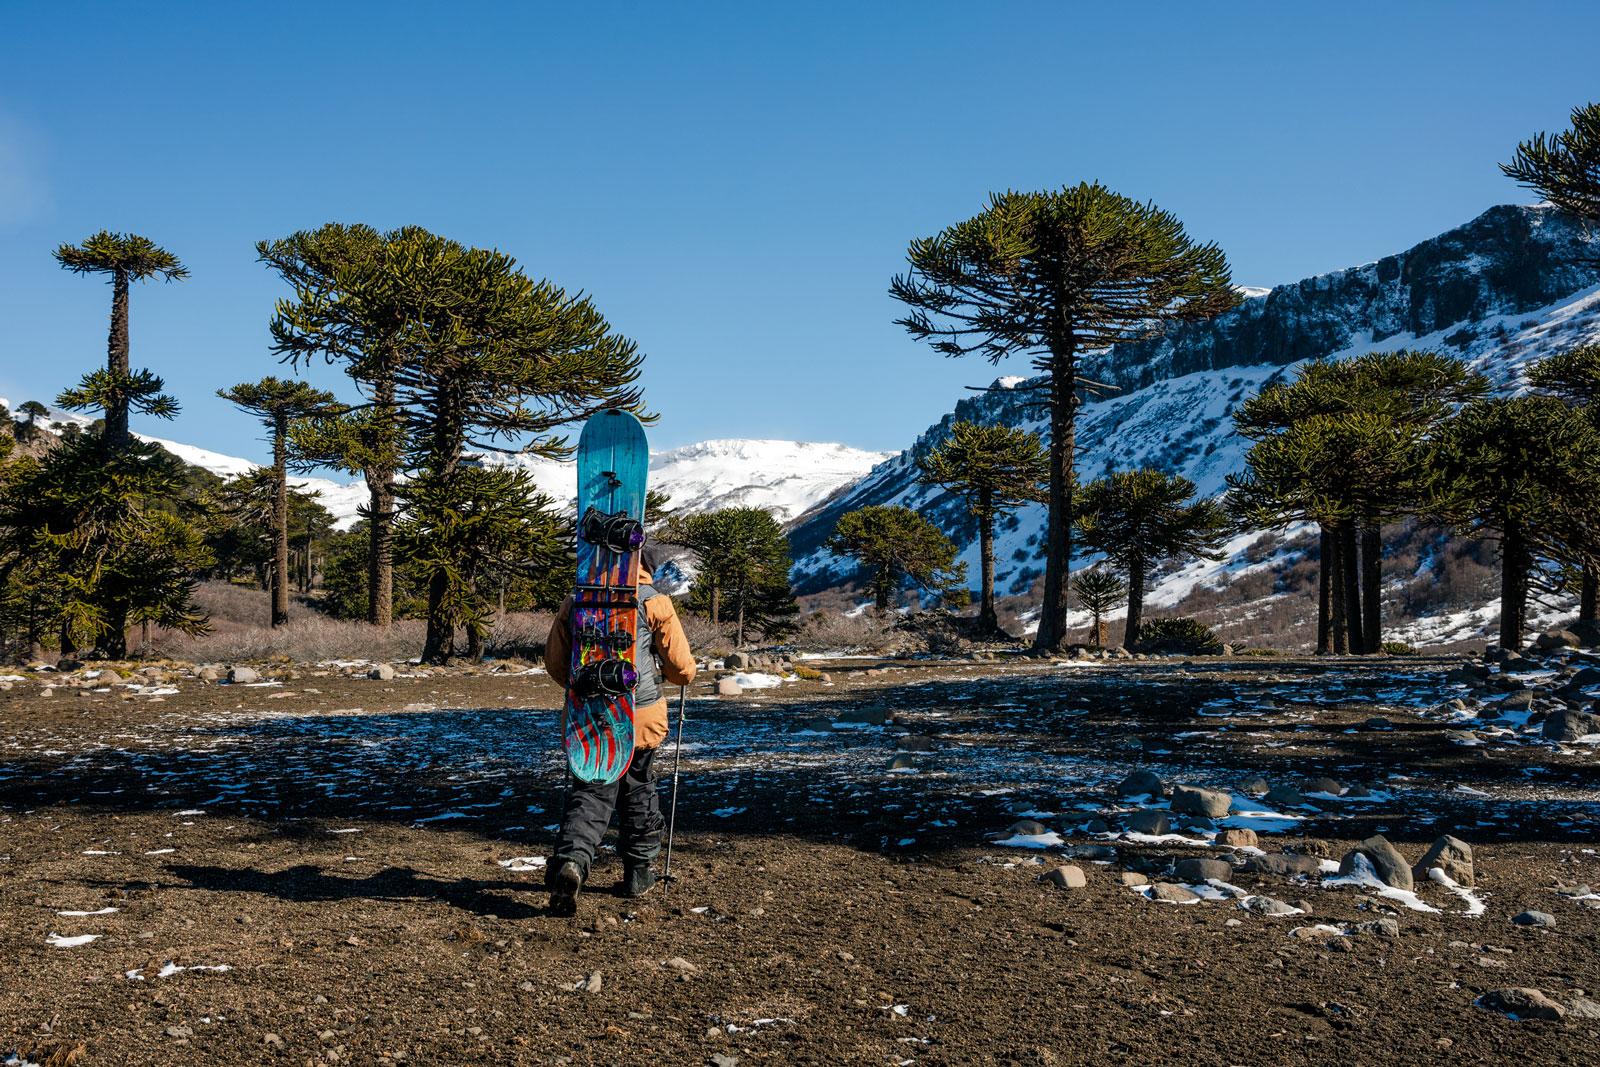 Earn your turns. Photo Courtesy: Ben Girardi - Adventure in Argentina